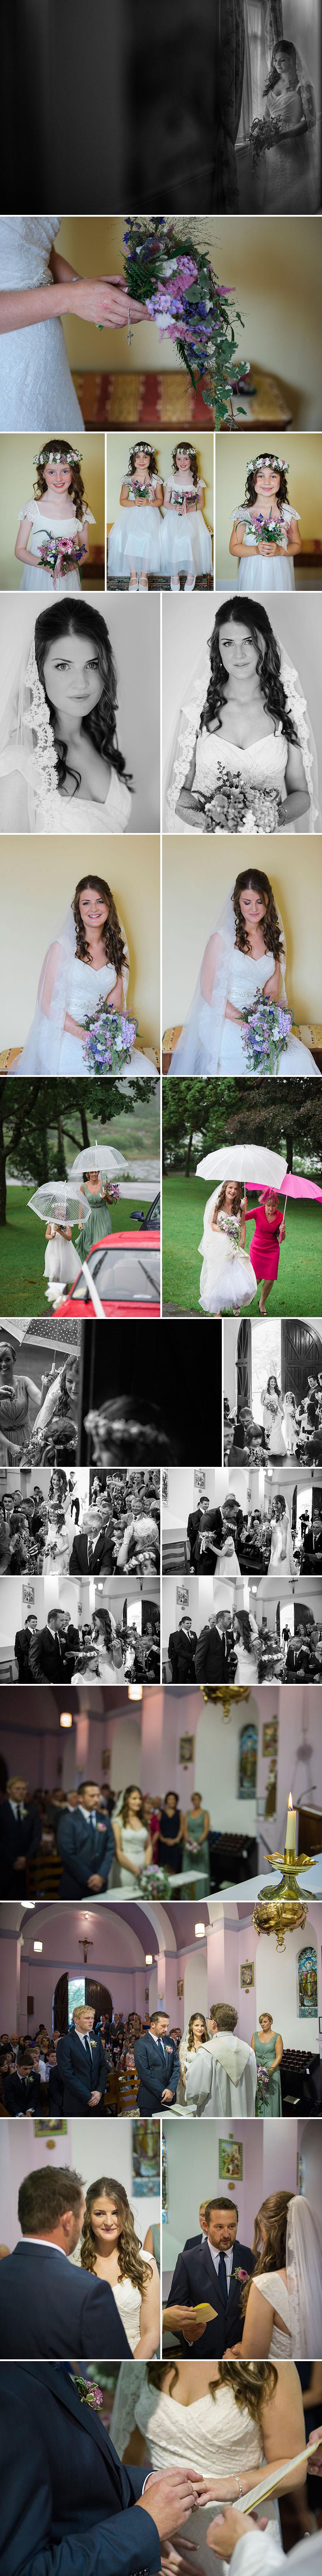 M + G | The Rectory Glandore Wedding | Cork Wedding Photography 3